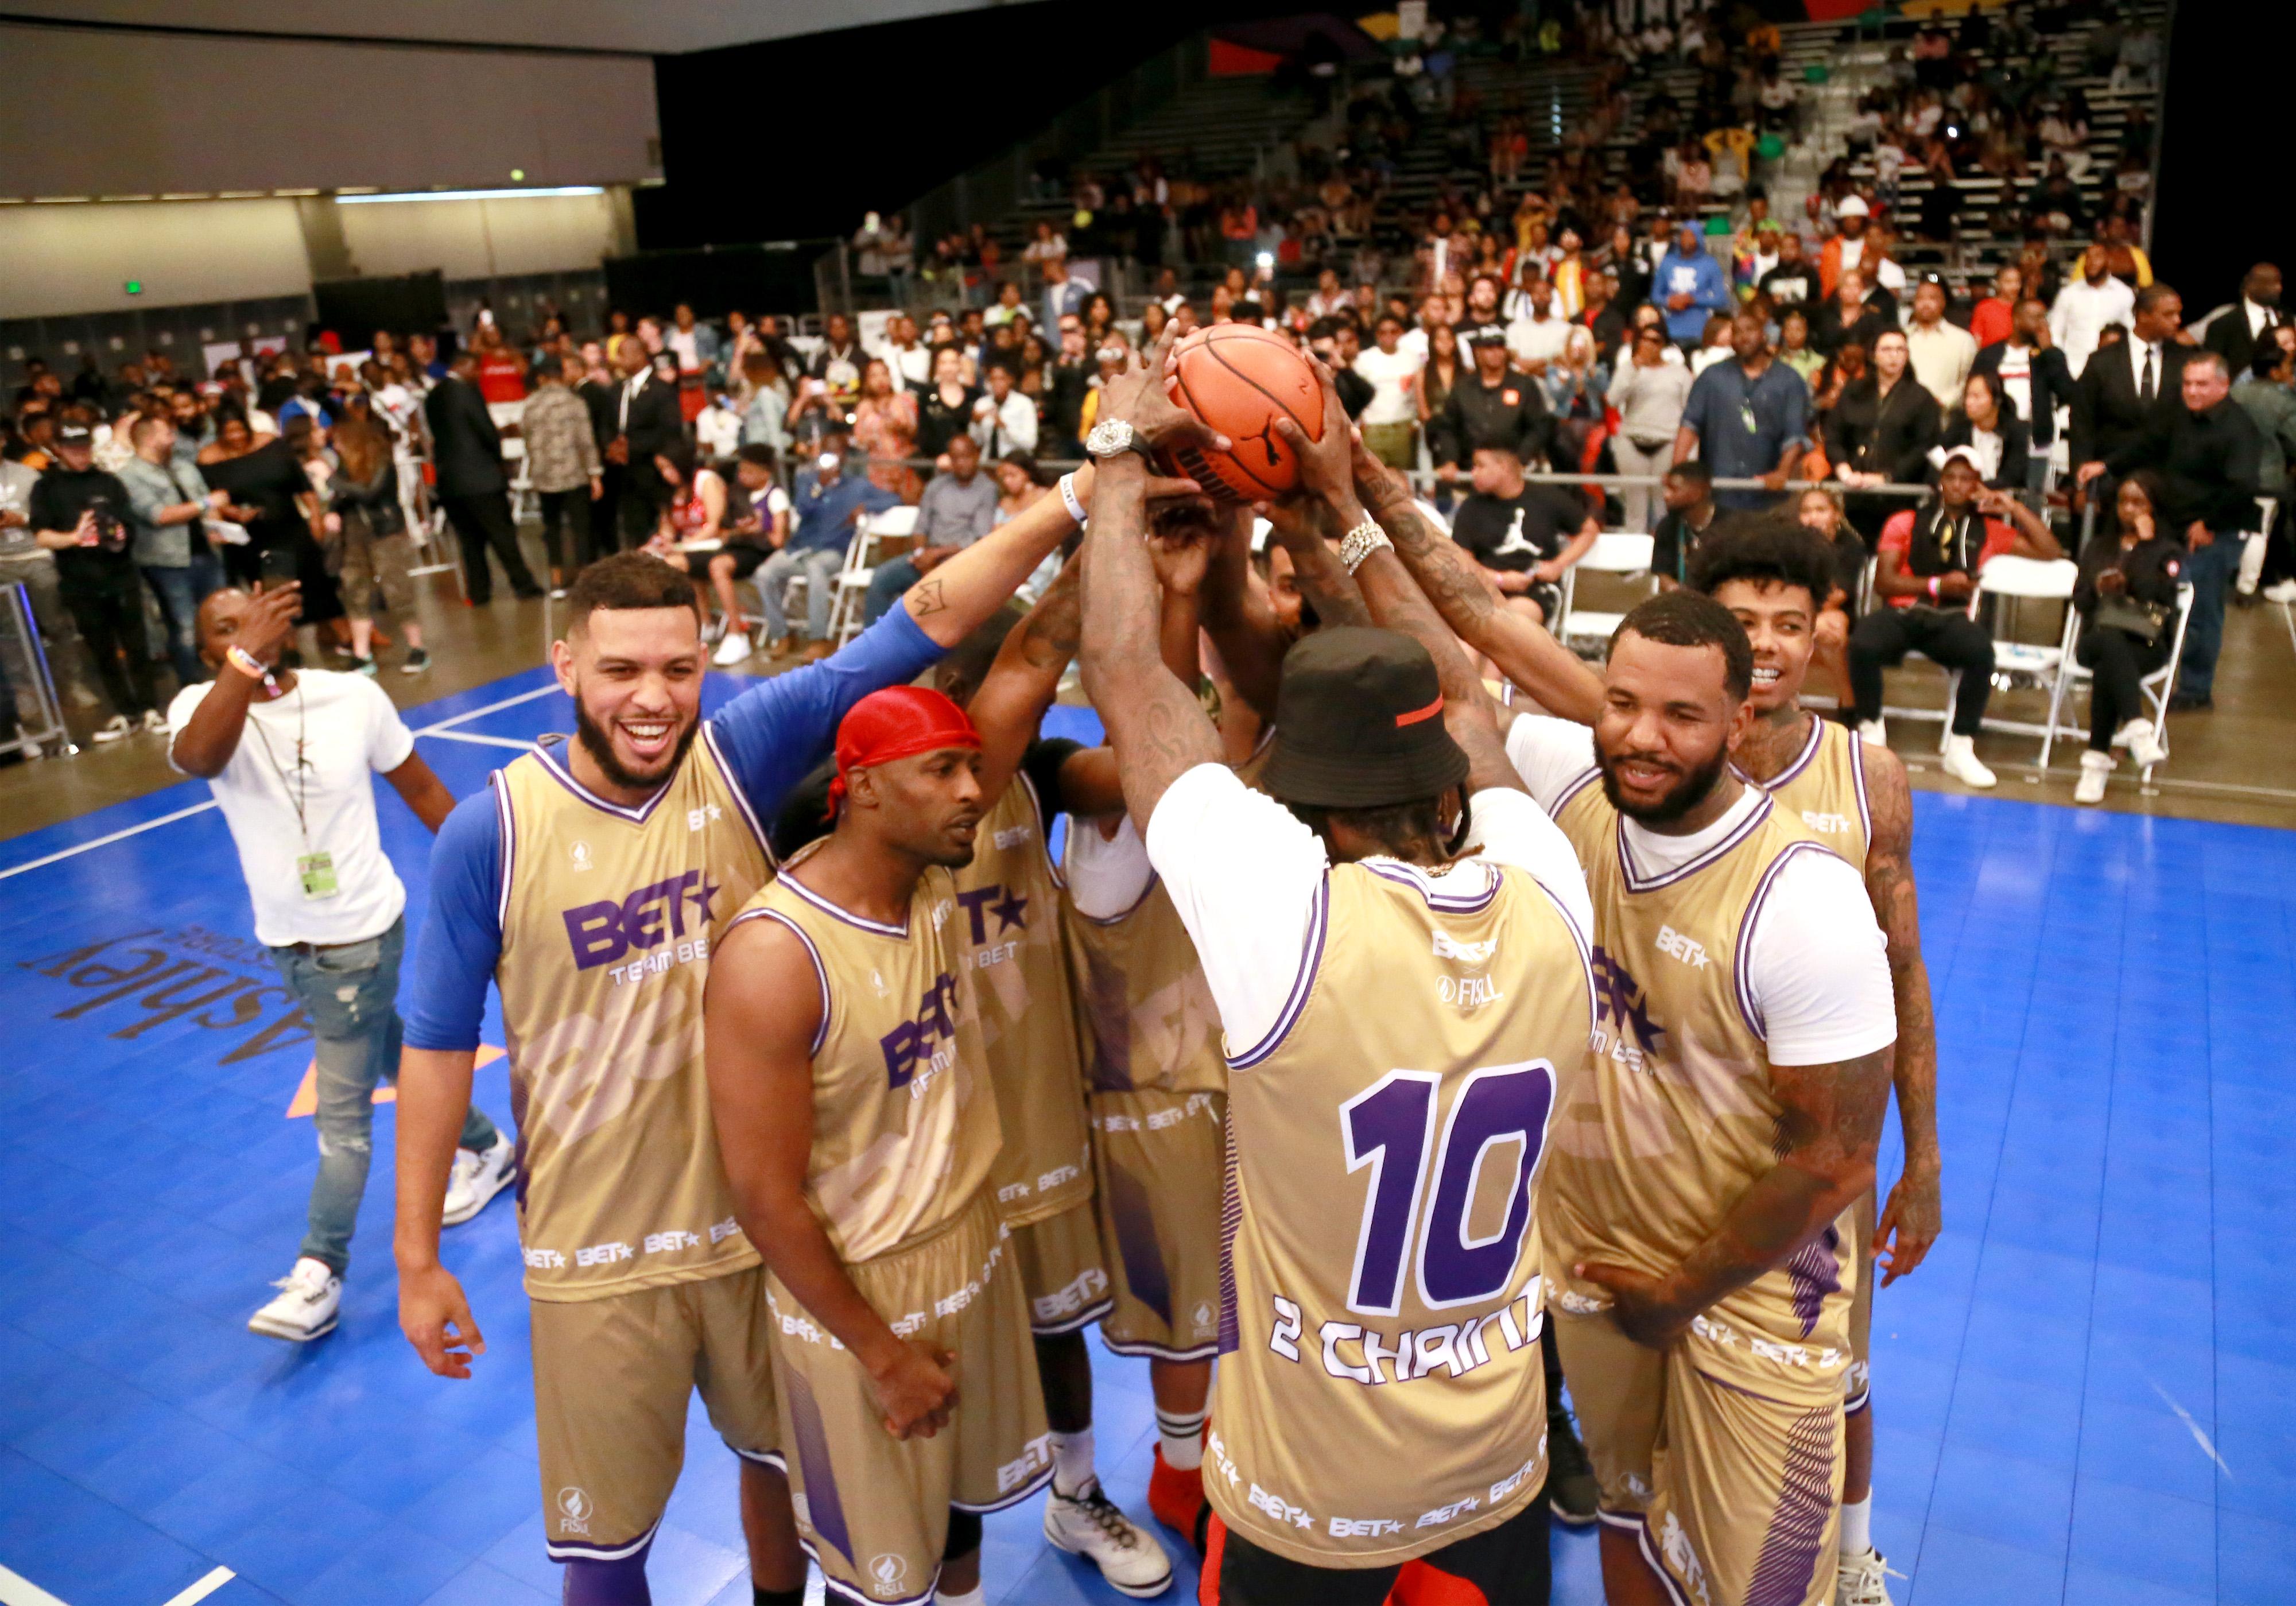 Betting it all on basketball game ambrose bettingen speisekarte guzzi